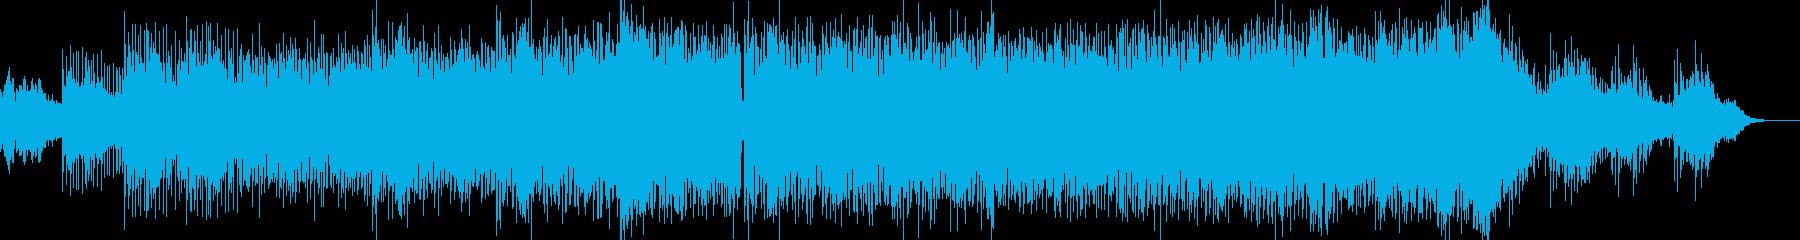 AI・近未来的なテクノの再生済みの波形